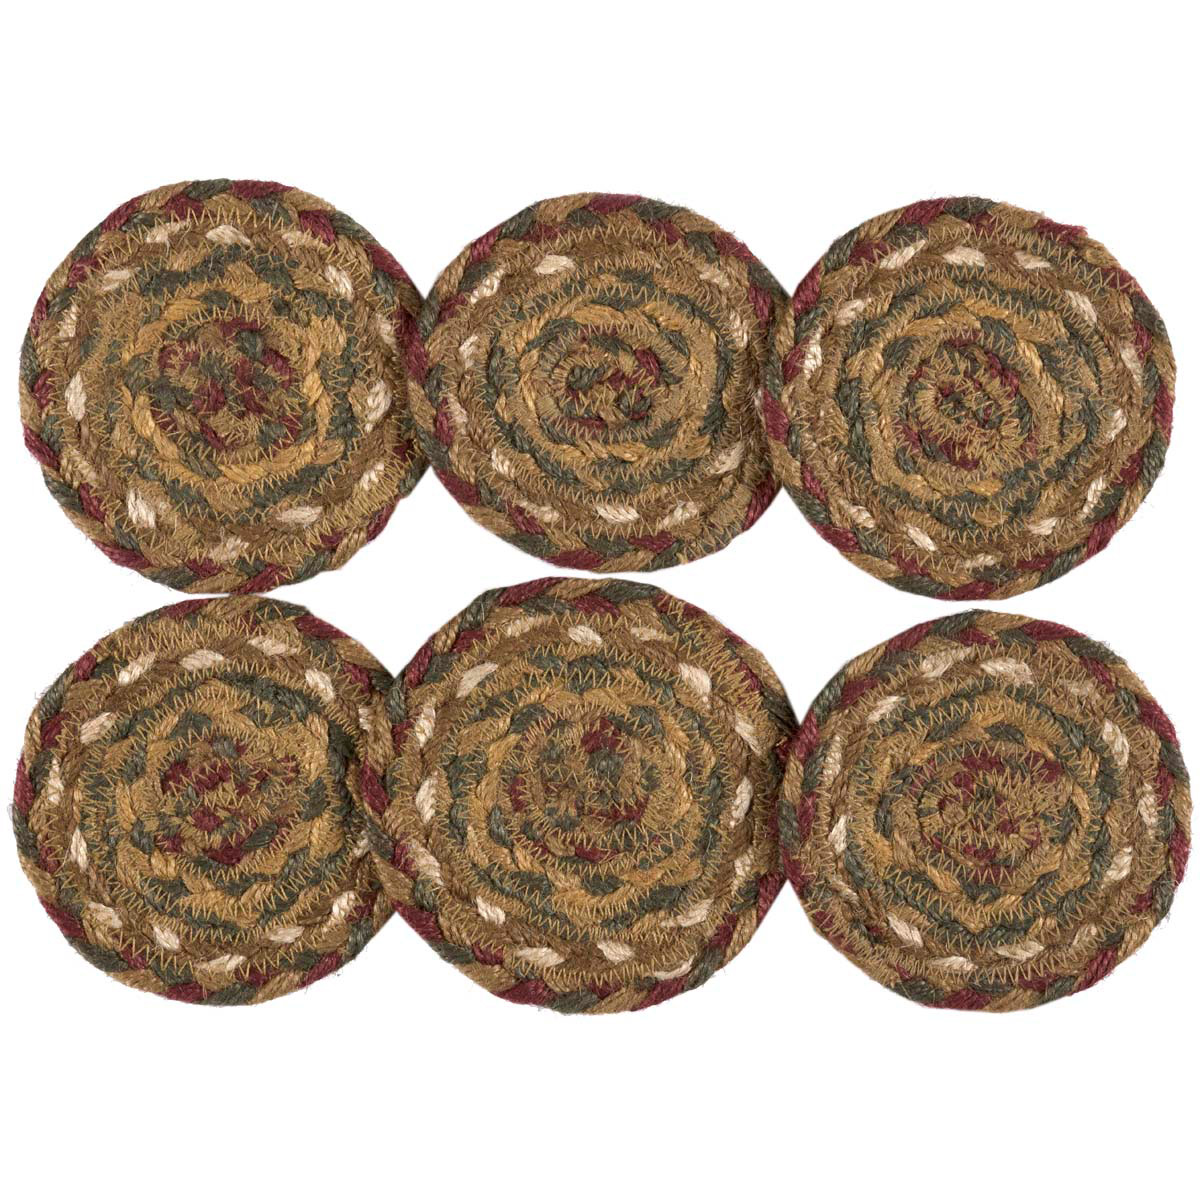 TEA CABIN Jute Oval Placemat Set//6 Braided Primitive Rustic Green//Crimson VHC